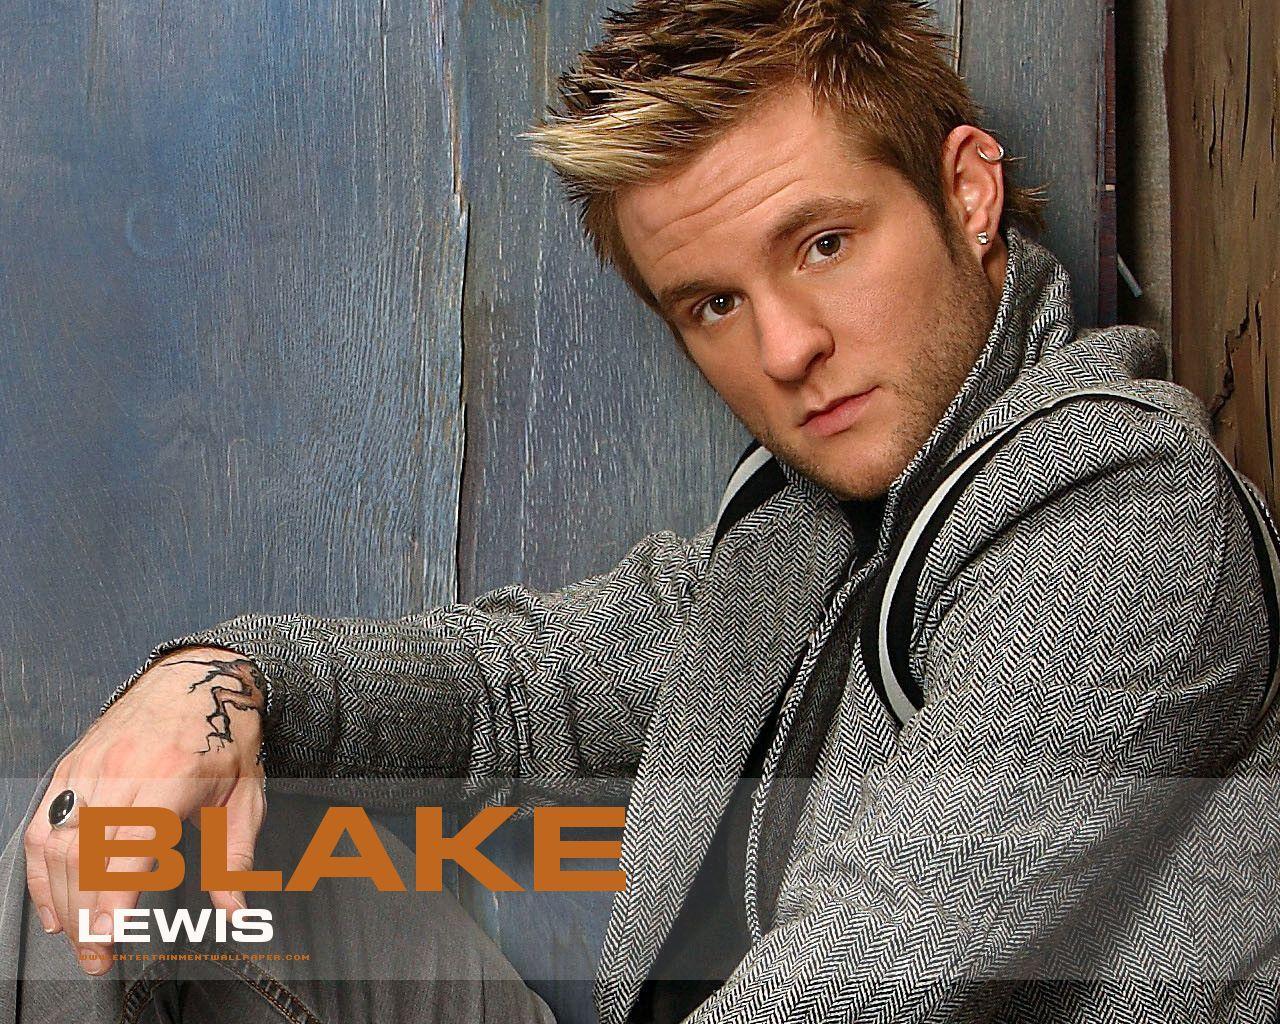 who is blake lewis dating Discover the most famous people named blake including blake gray, blake shelton, blake lively, blake michael, blake richardson and many more.